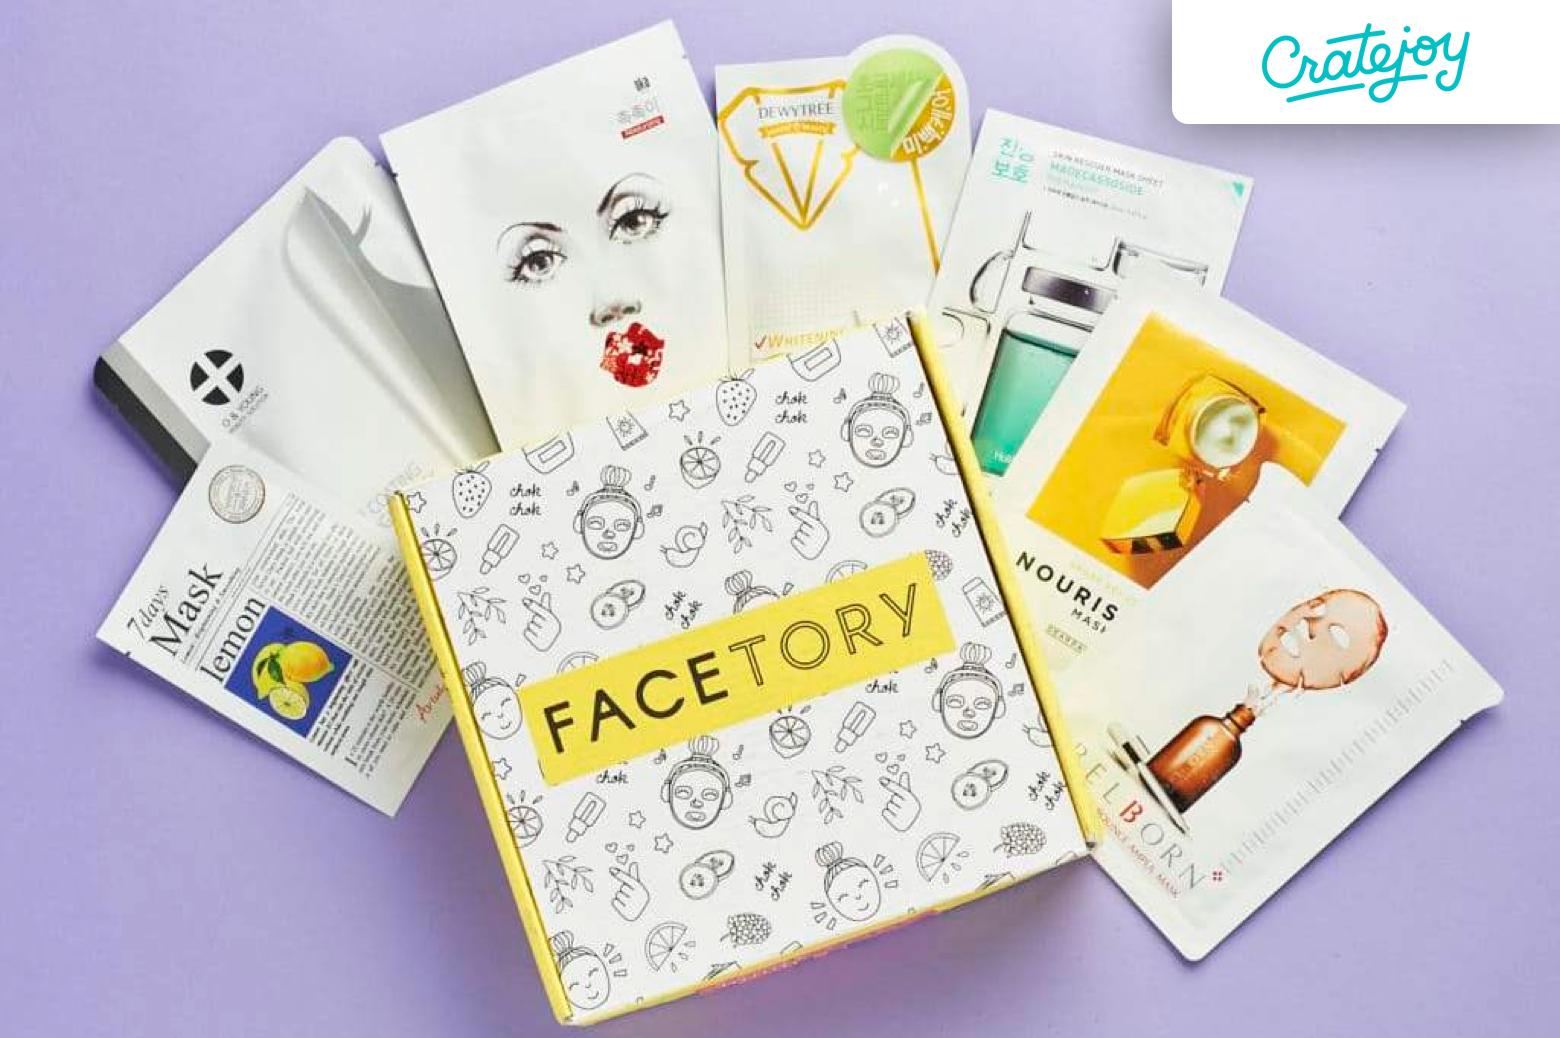 FaceTory cosmetic box | Cratejoy